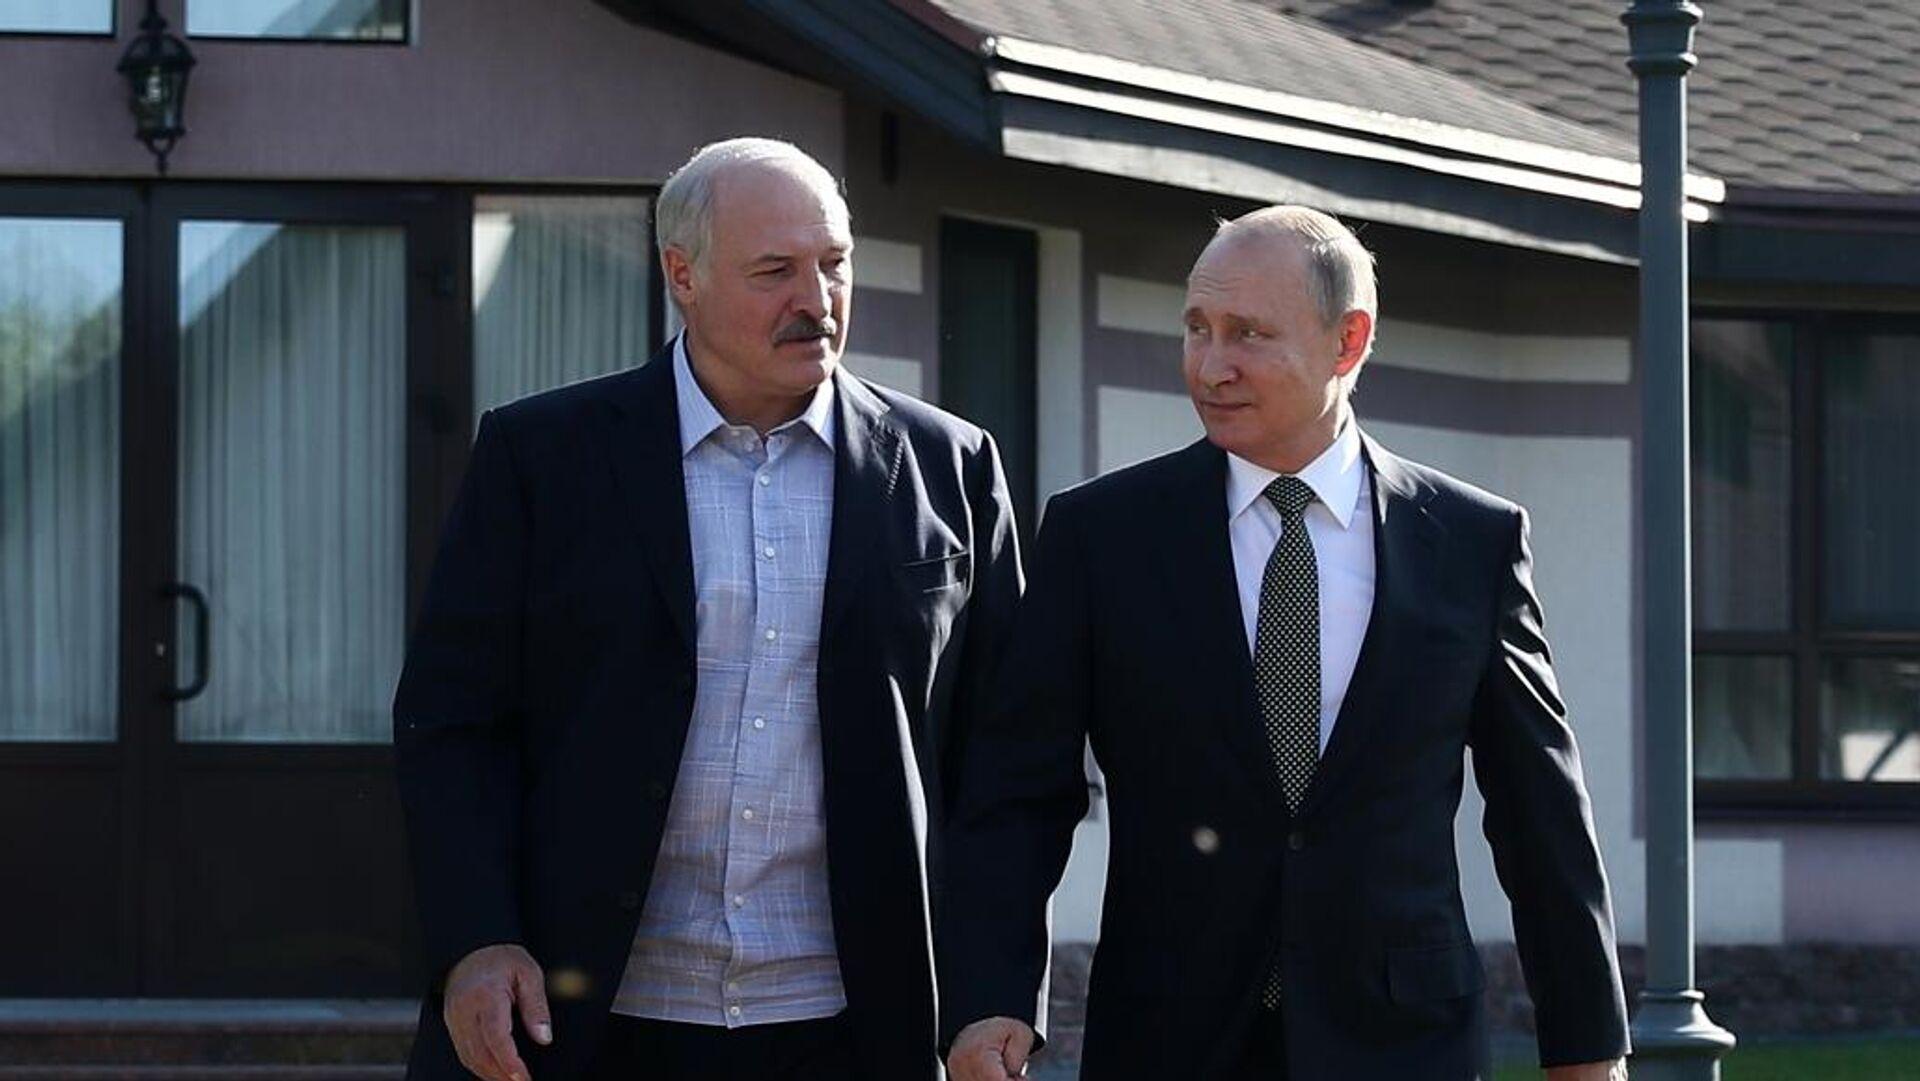 Президент РФ Владимир Путин и президент Белоруссии Александр Лукашенко - РИА Новости, 1920, 16.09.2020